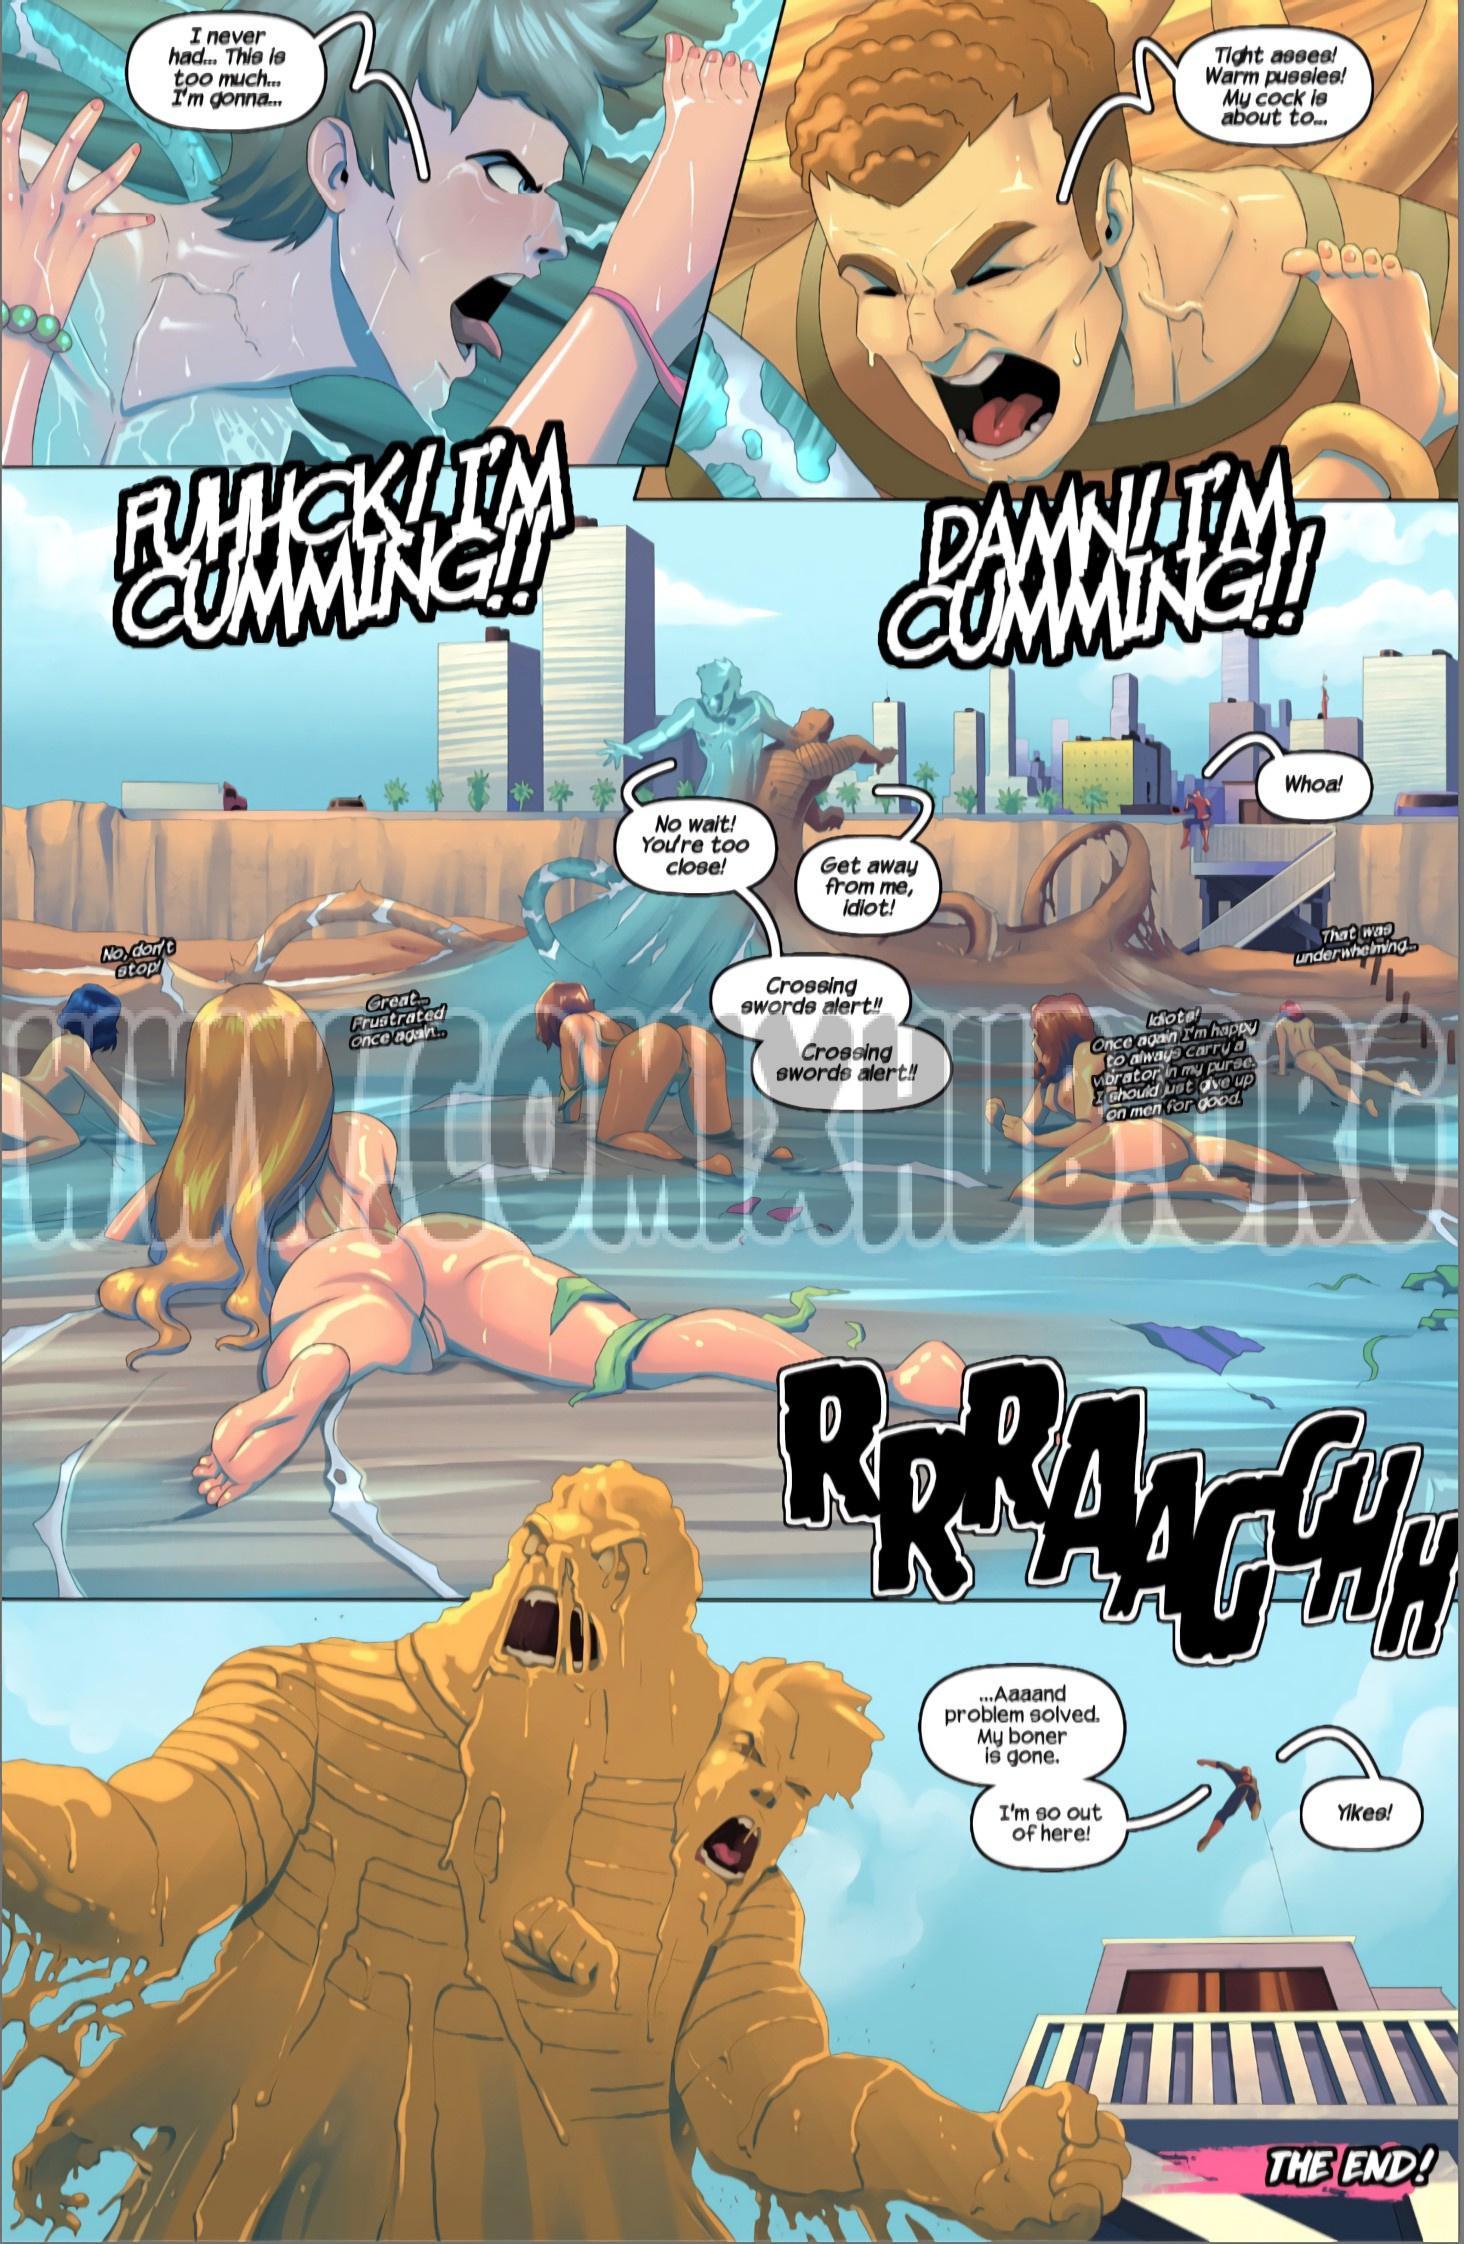 Sandy vs Watery porn comics Oral sex, Anal Sex, Bikini, Blowjob, Deepthroat, Double Penetration, Straight, Tentacles